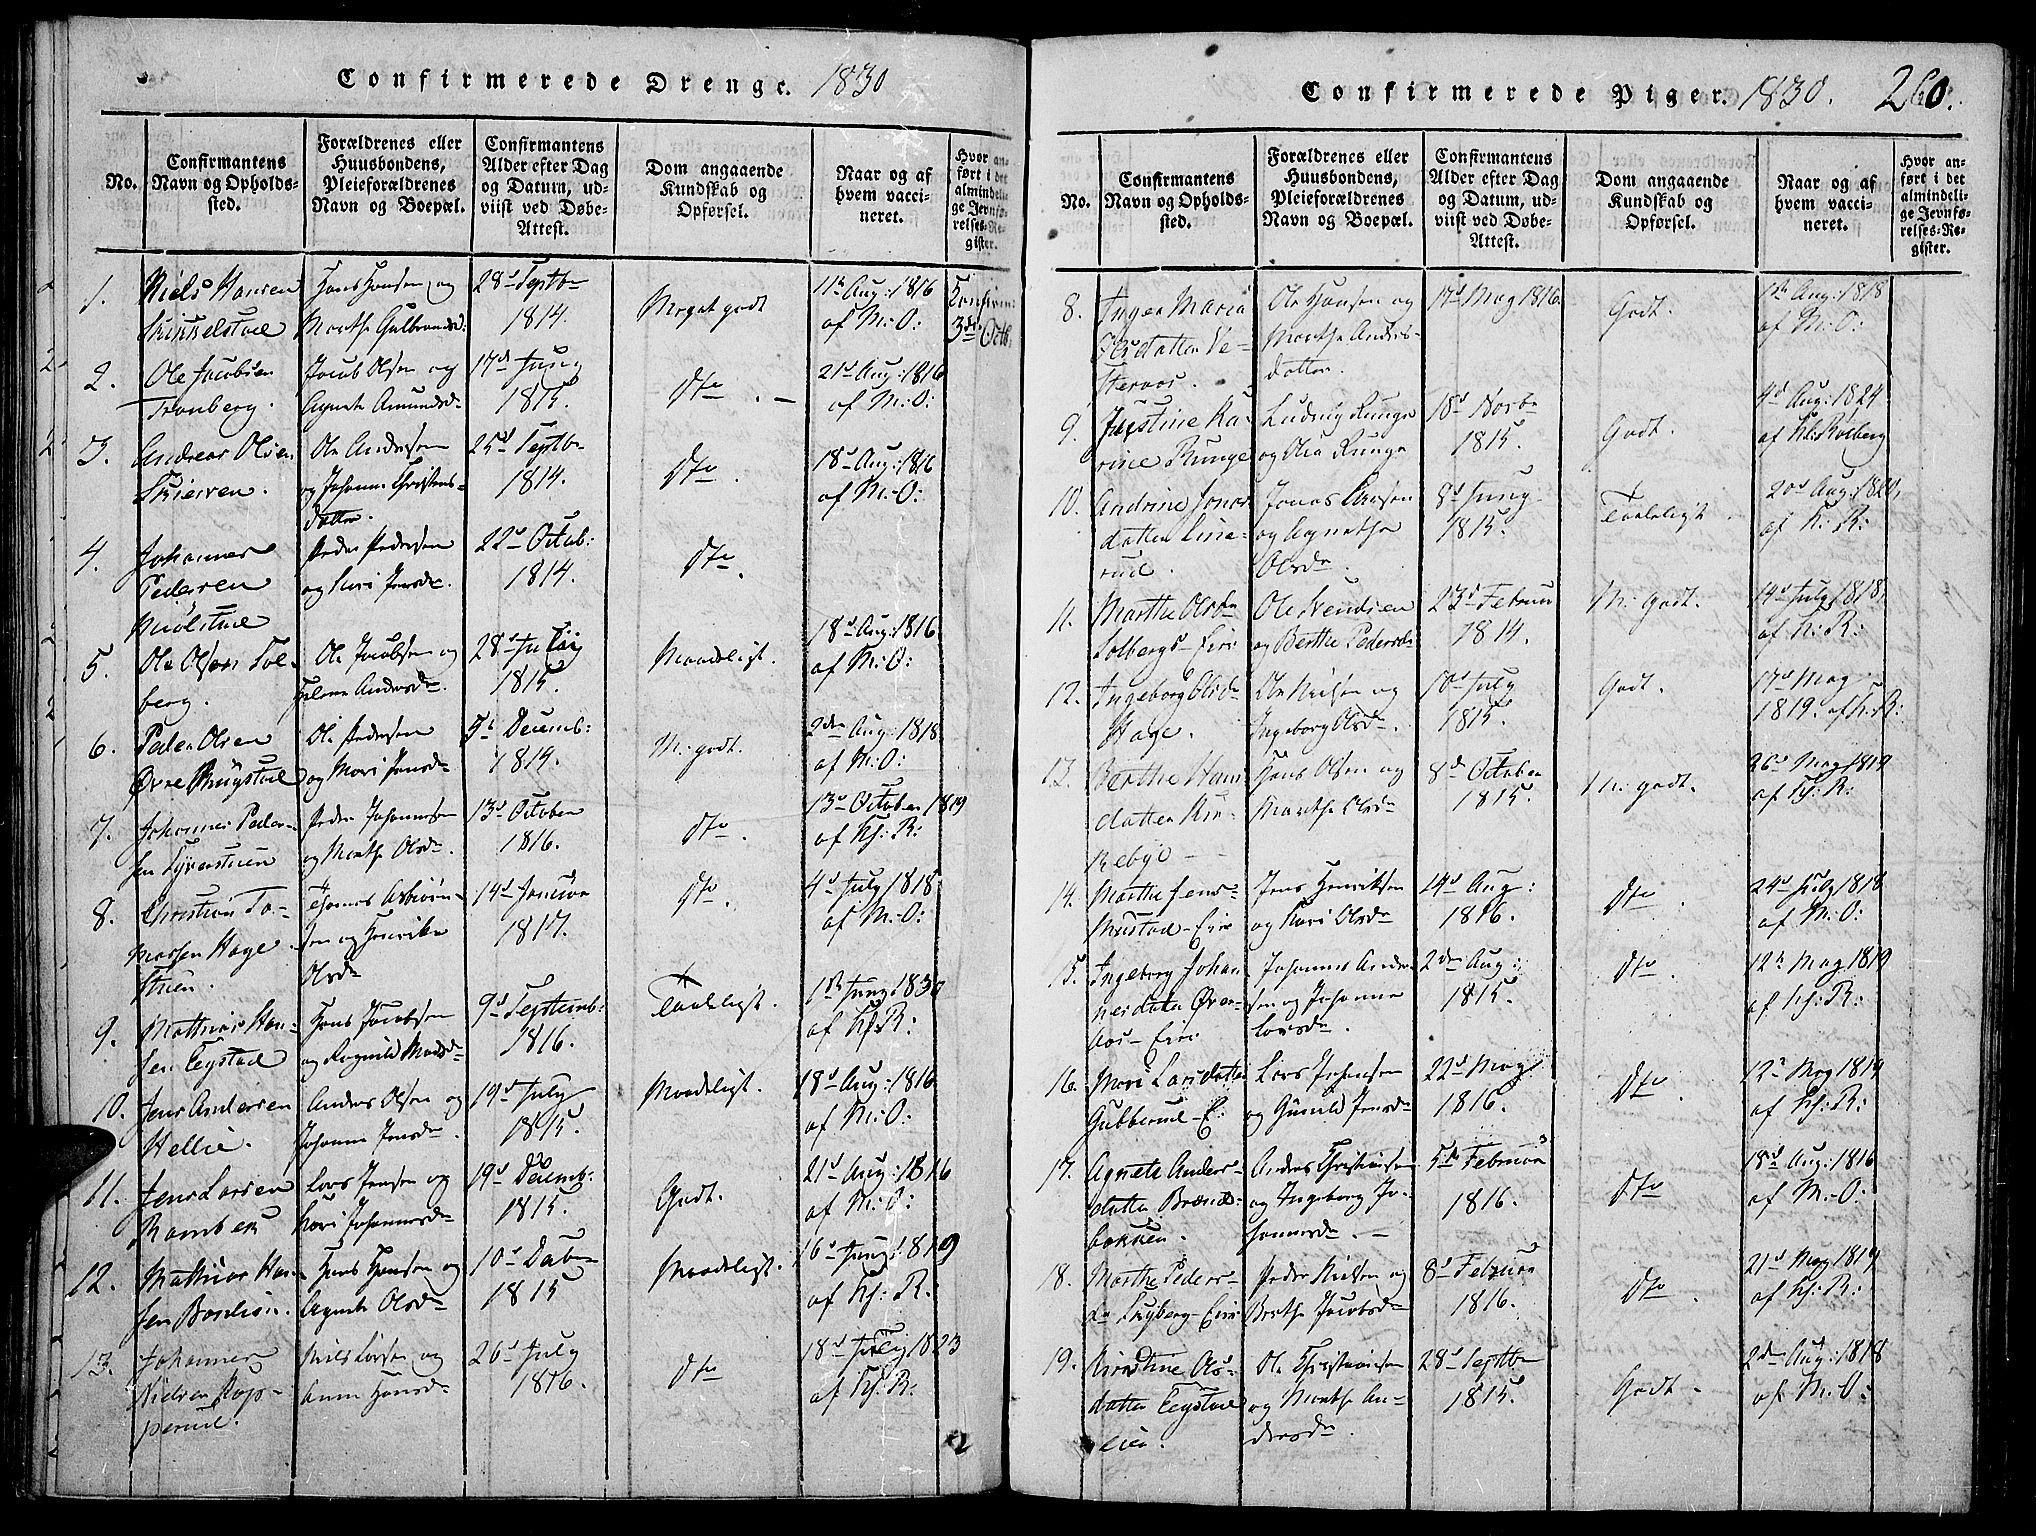 SAH, Vardal prestekontor, H/Ha/Haa/L0004: Ministerialbok nr. 4, 1814-1831, s. 260